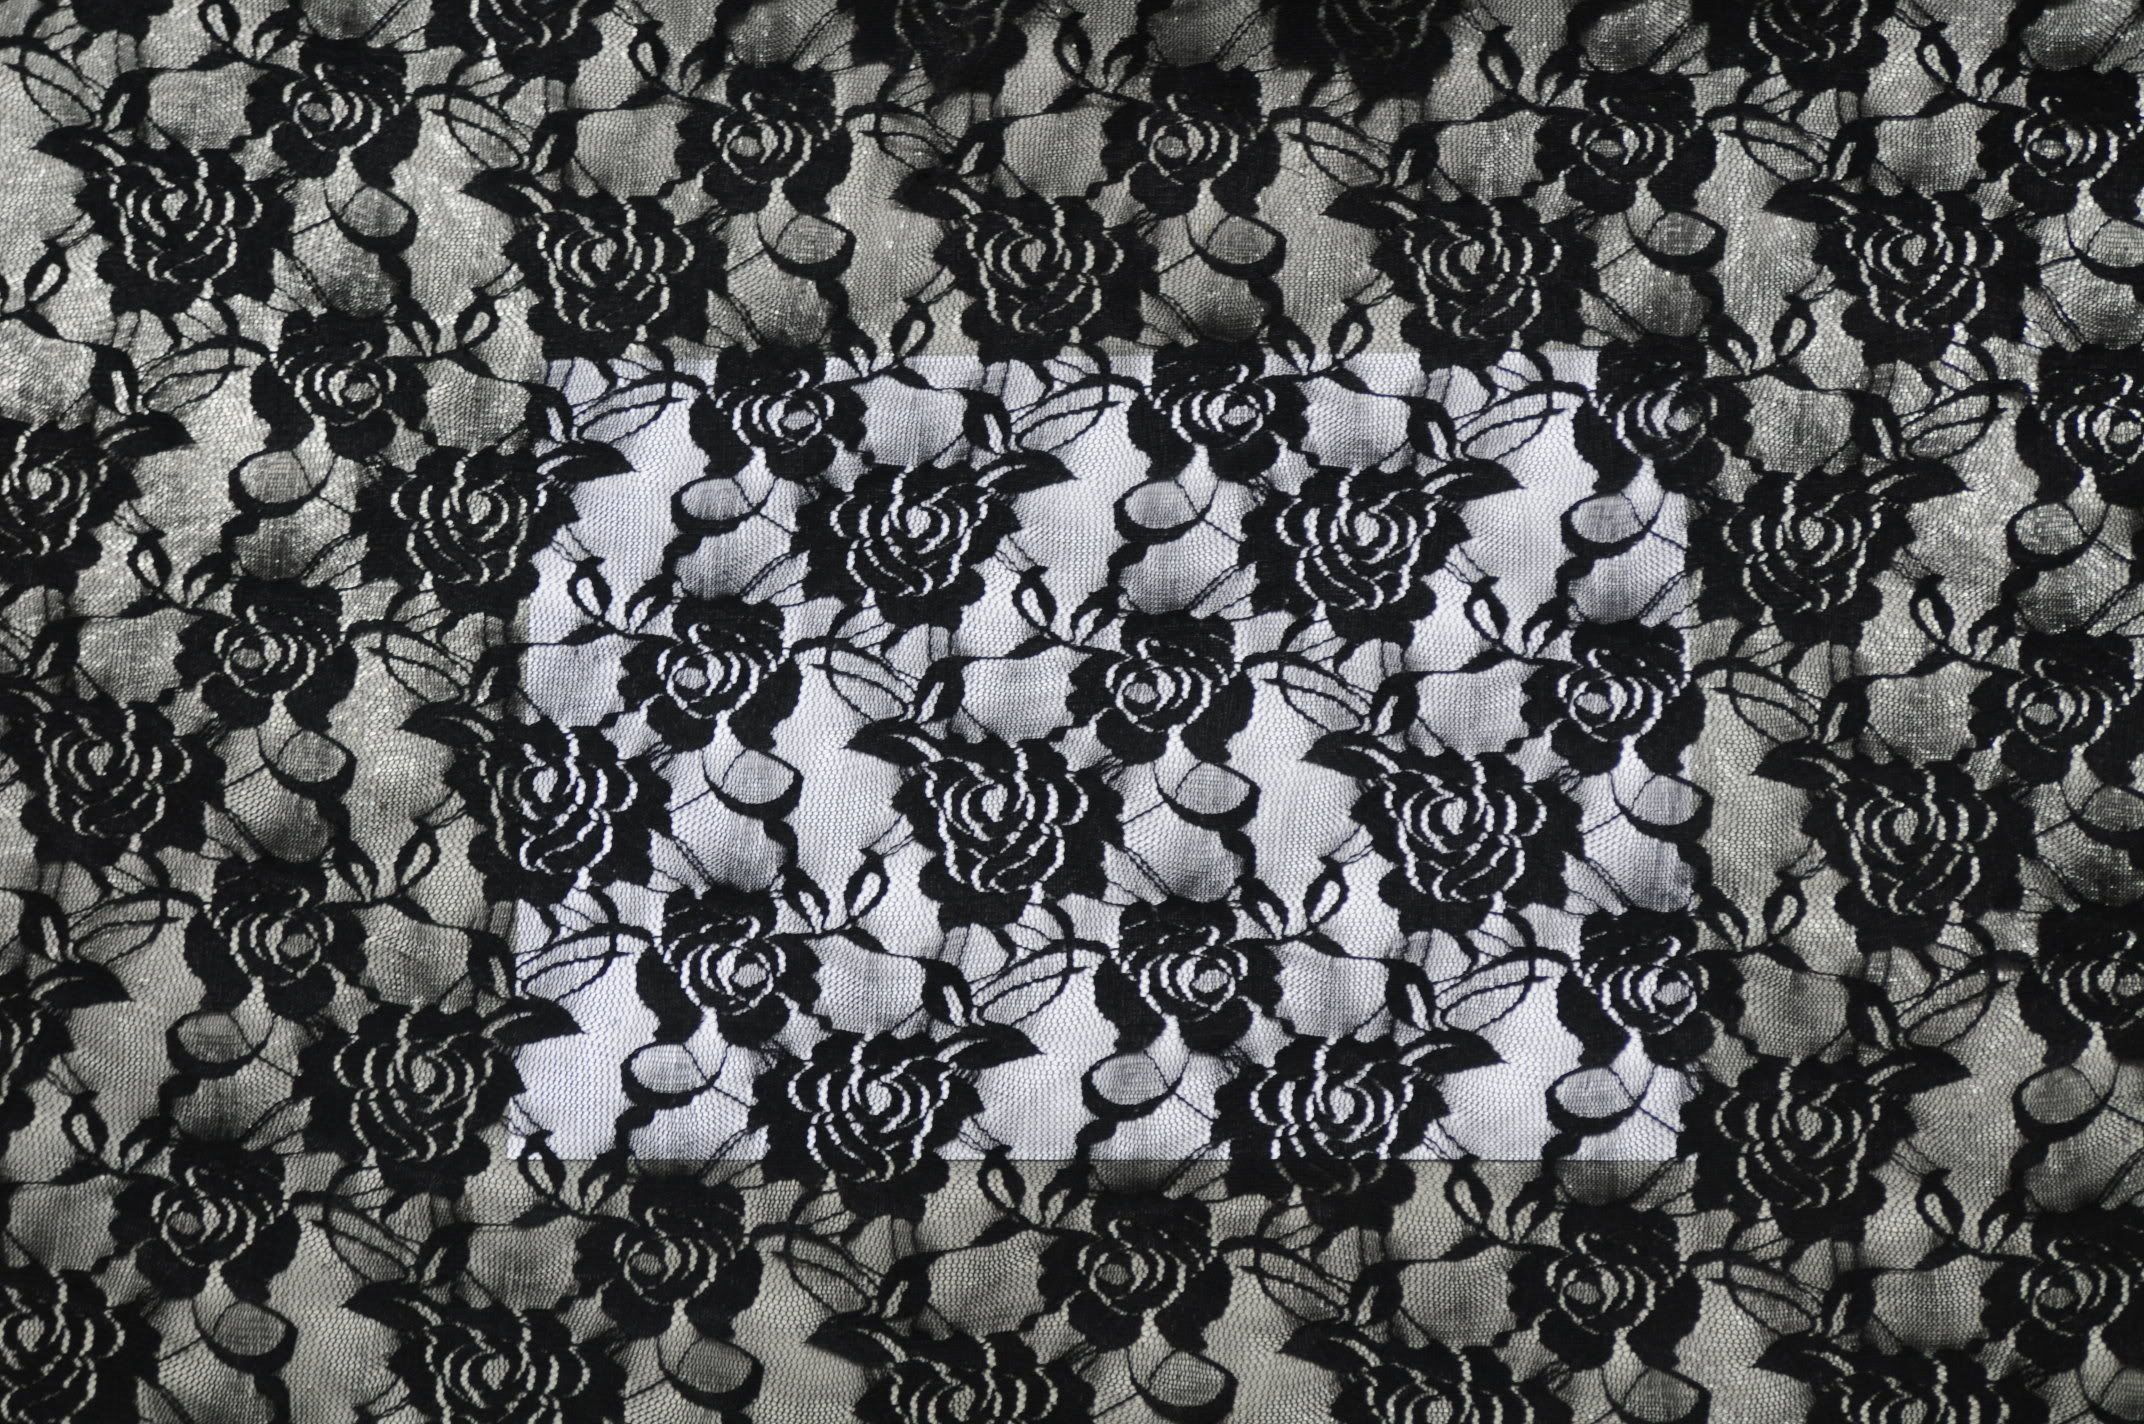 100 polyester new black lace rose pattern web net fabric